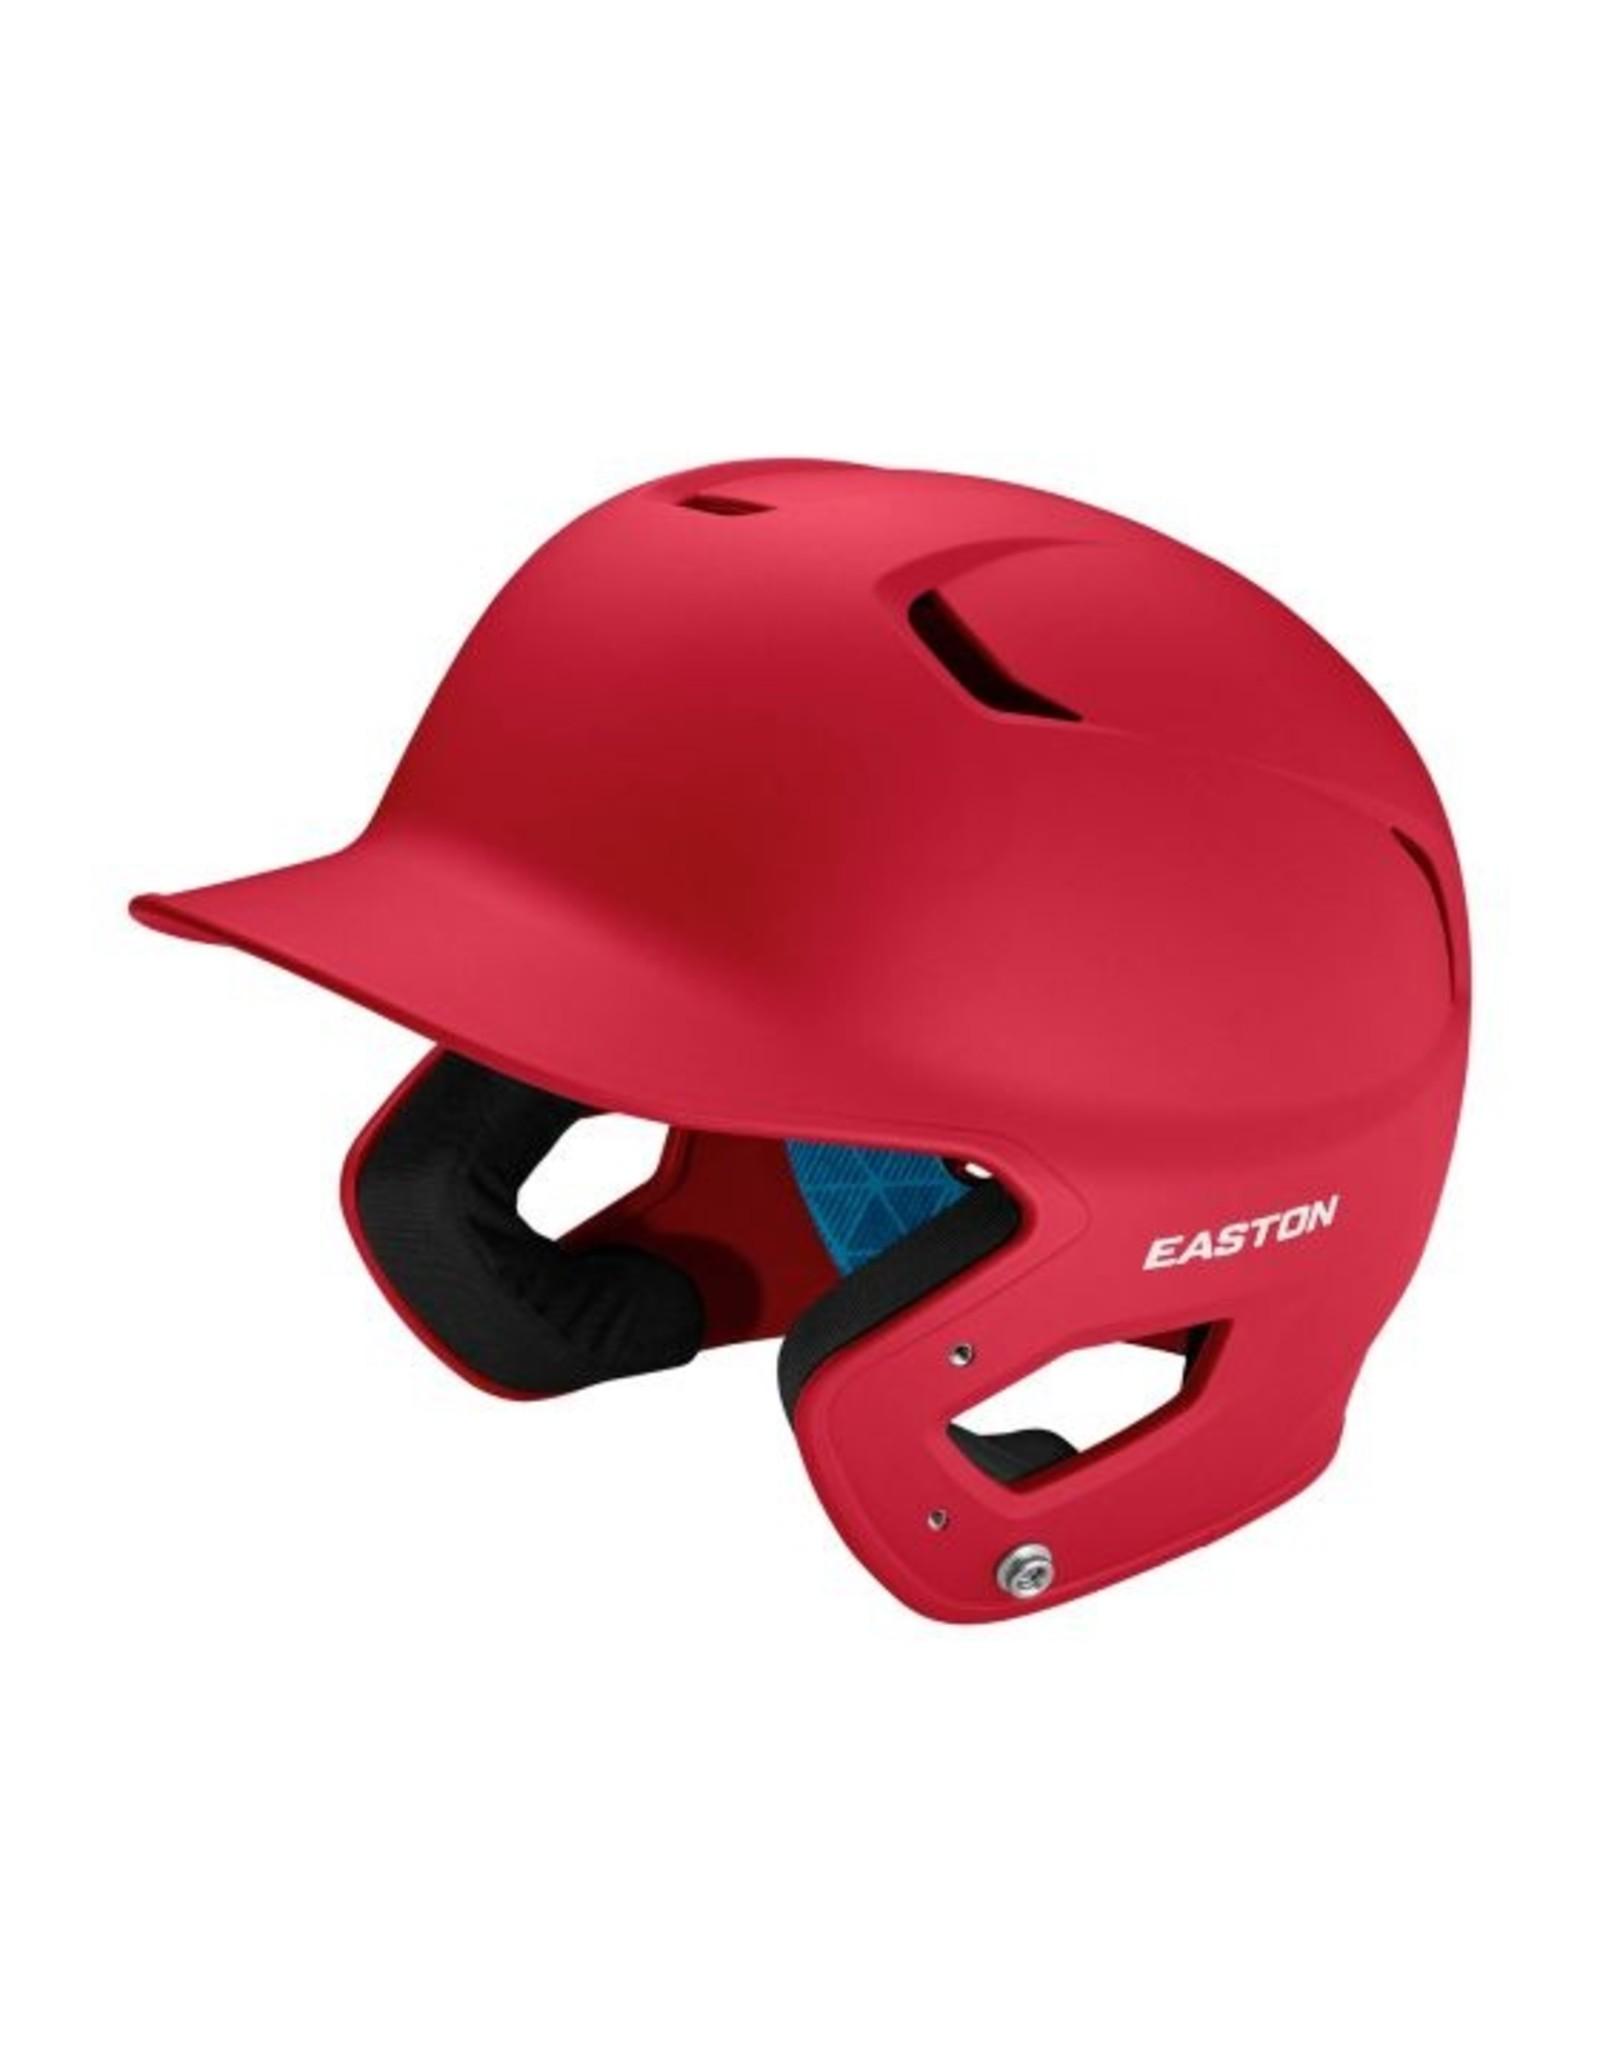 EASTON (CANADA) Easton - Casque Z5 2.0 Helmet